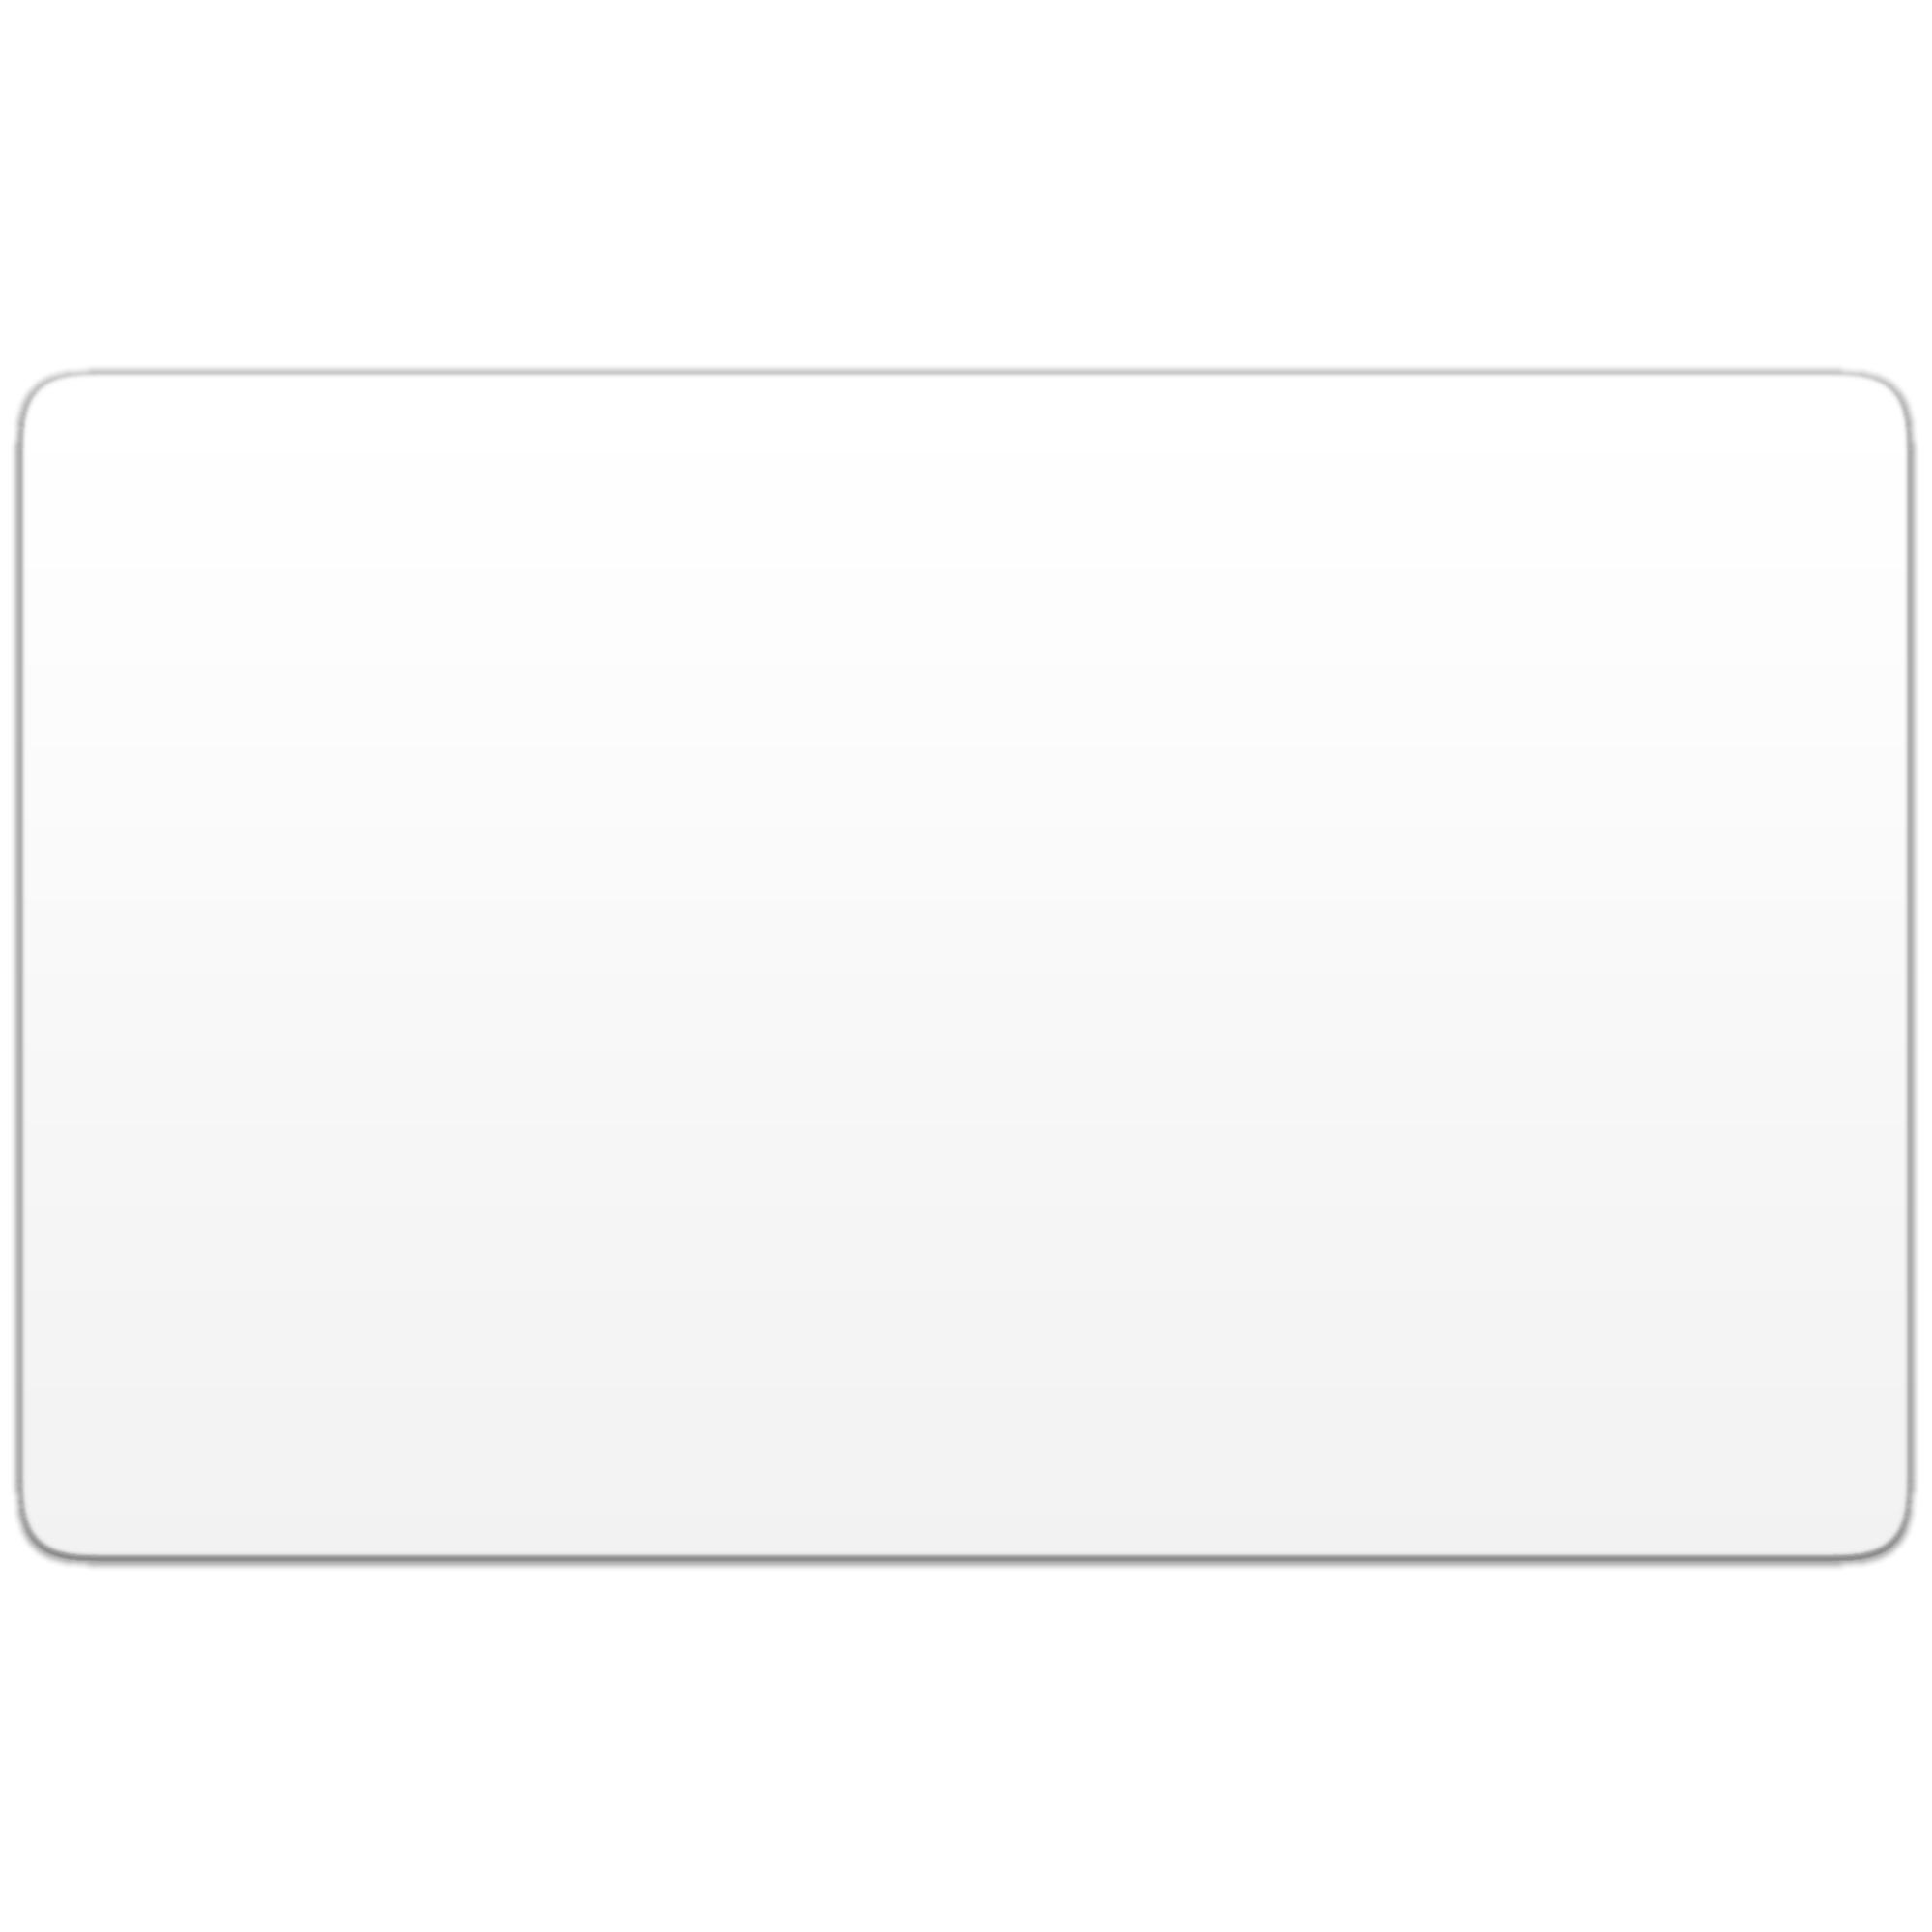 Безконтактна пластикова карта Icode Sli-S (ISO15693) для прямого друку